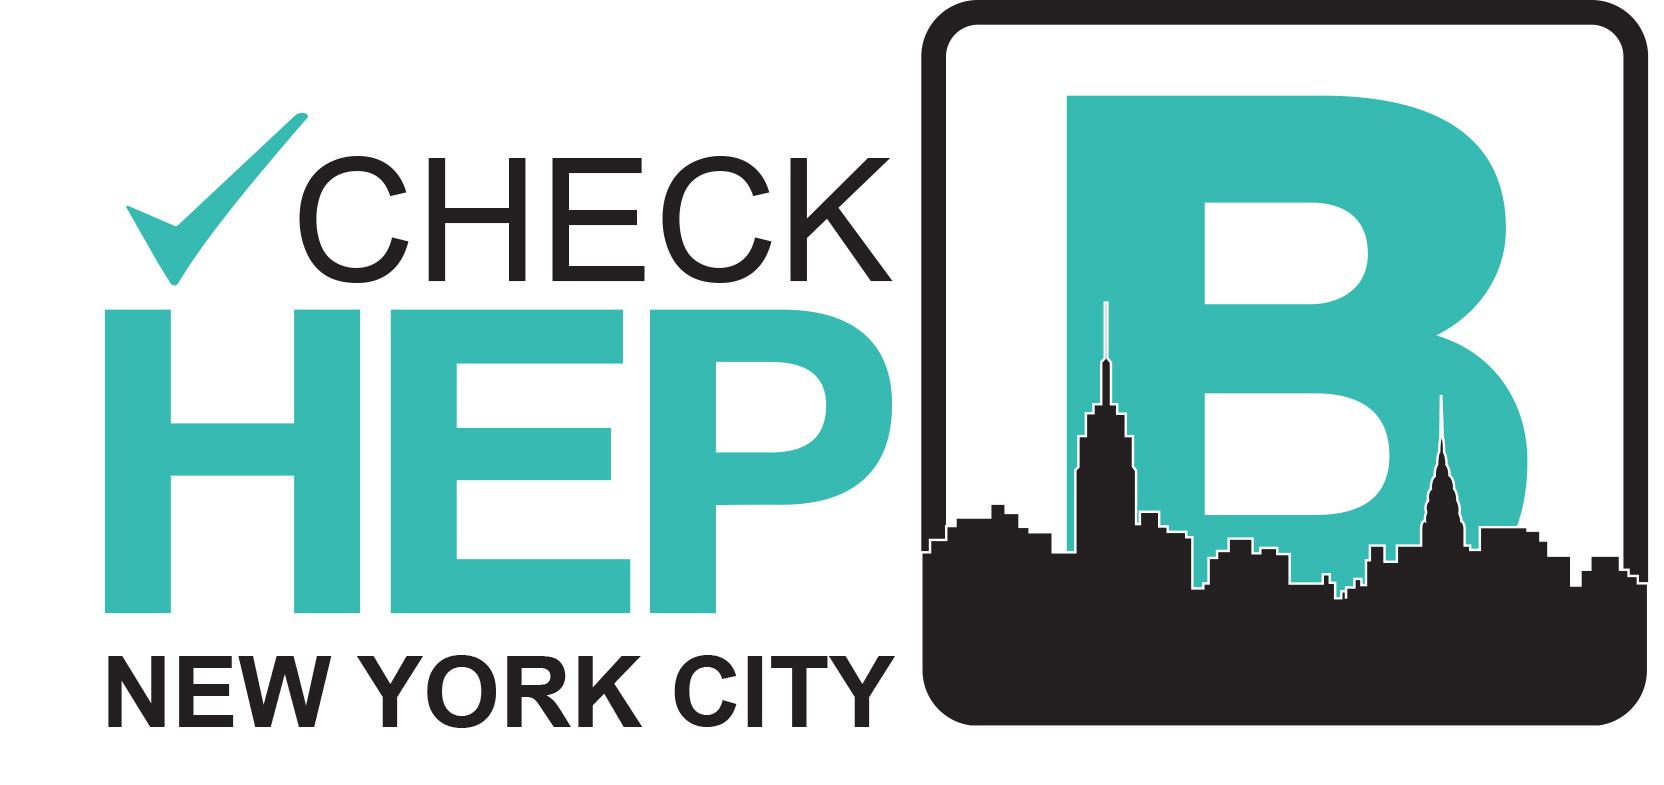 Check Hep B Logo